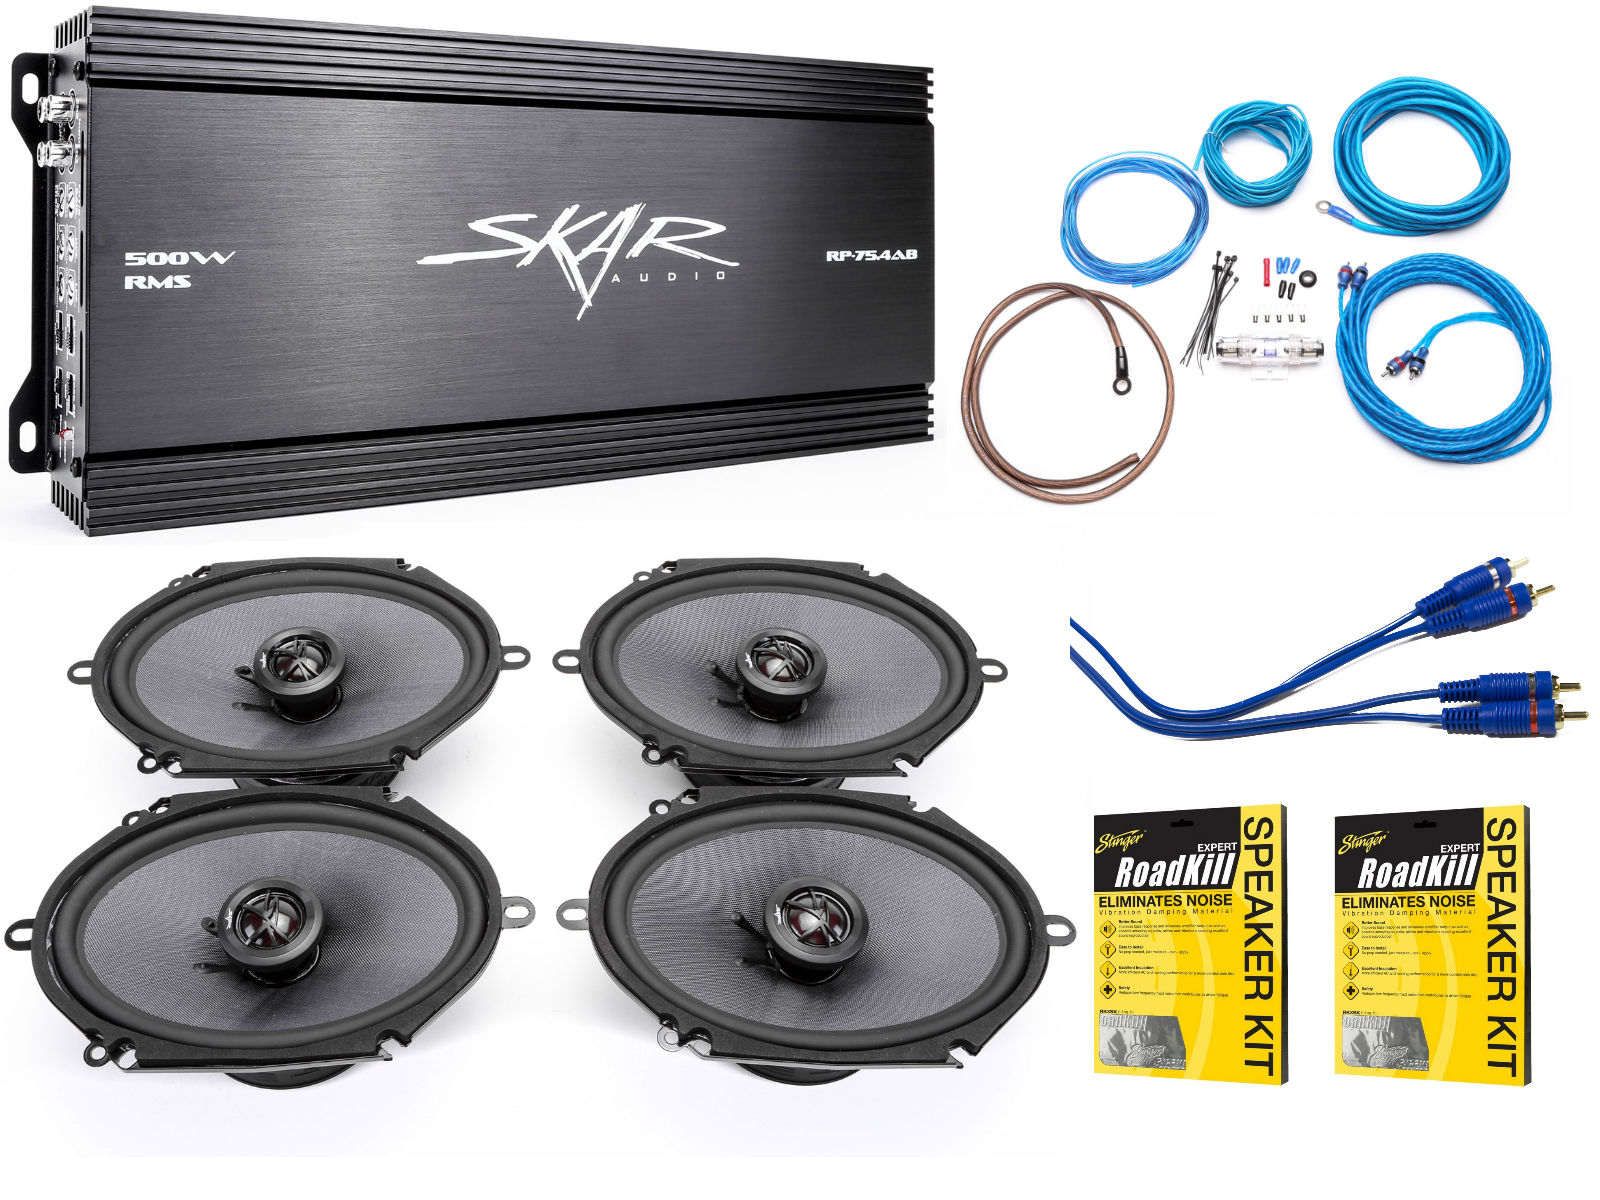 medium resolution of skar audio 6 x8 complete elite speaker upgrade package with skar audio subwoofer wiring diagram skar audio wiring